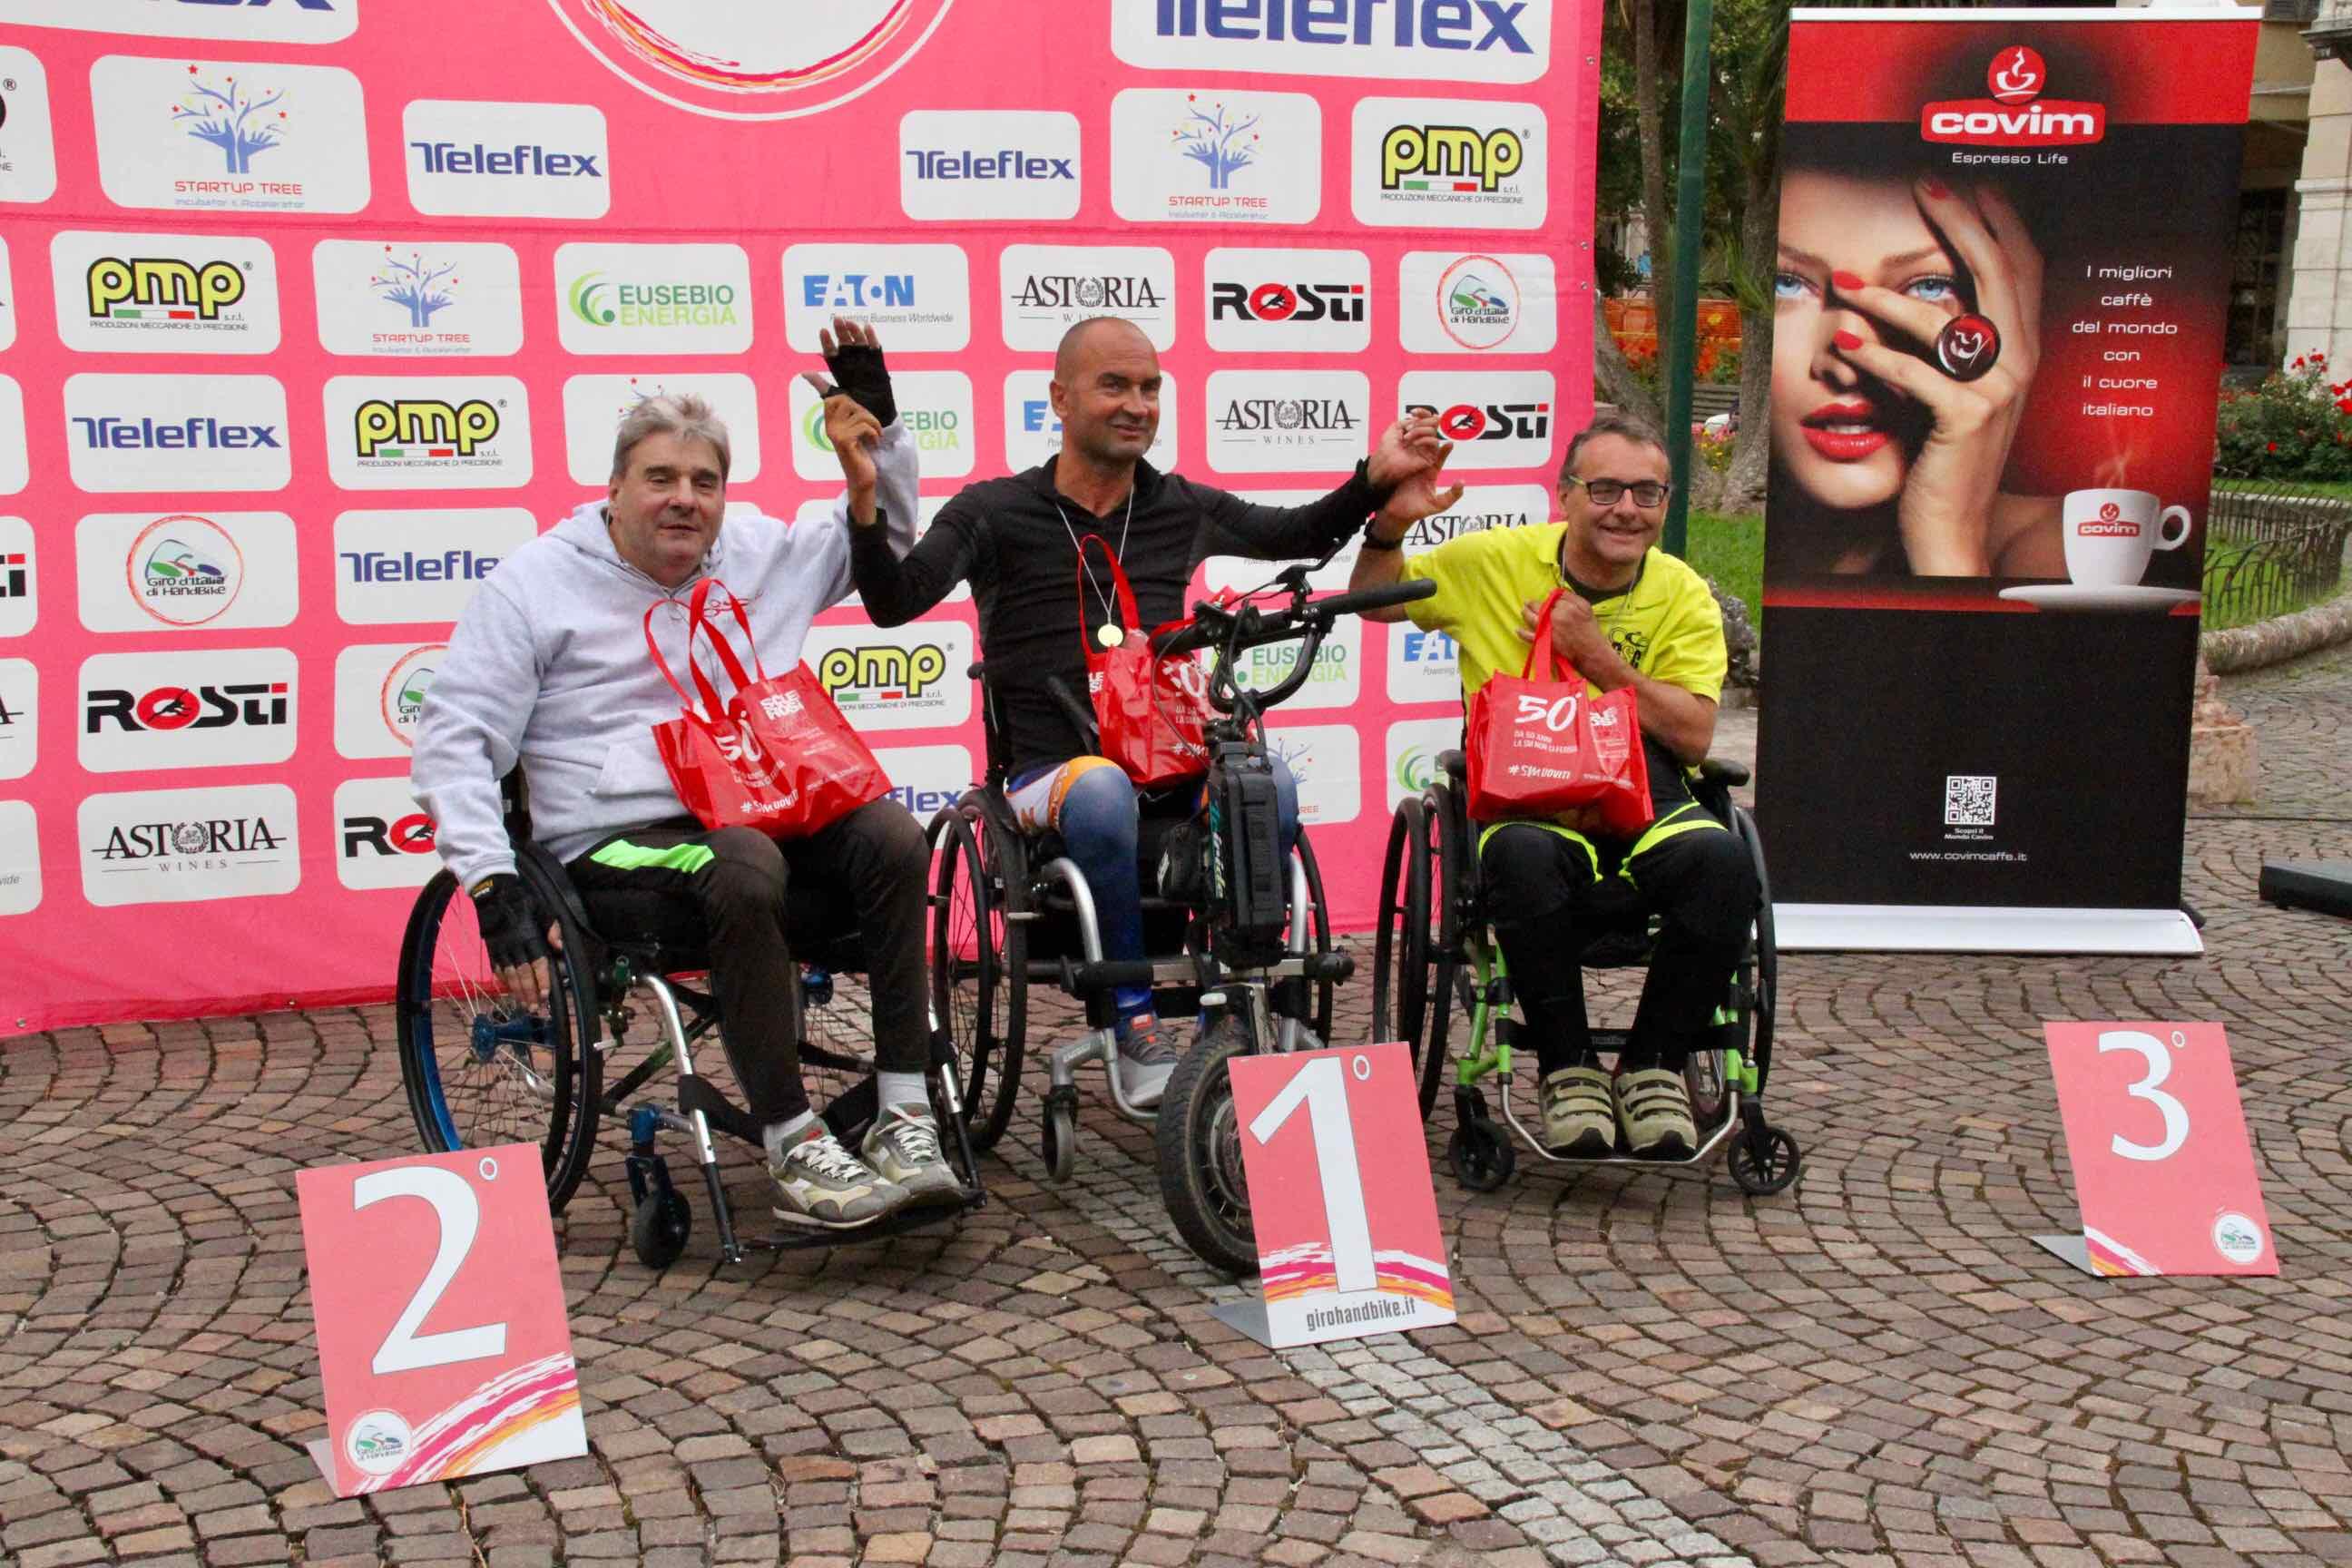 1° Memorial don Nando Negri a Chiavari per il Giro d'Italia Handbike 2018 - 19